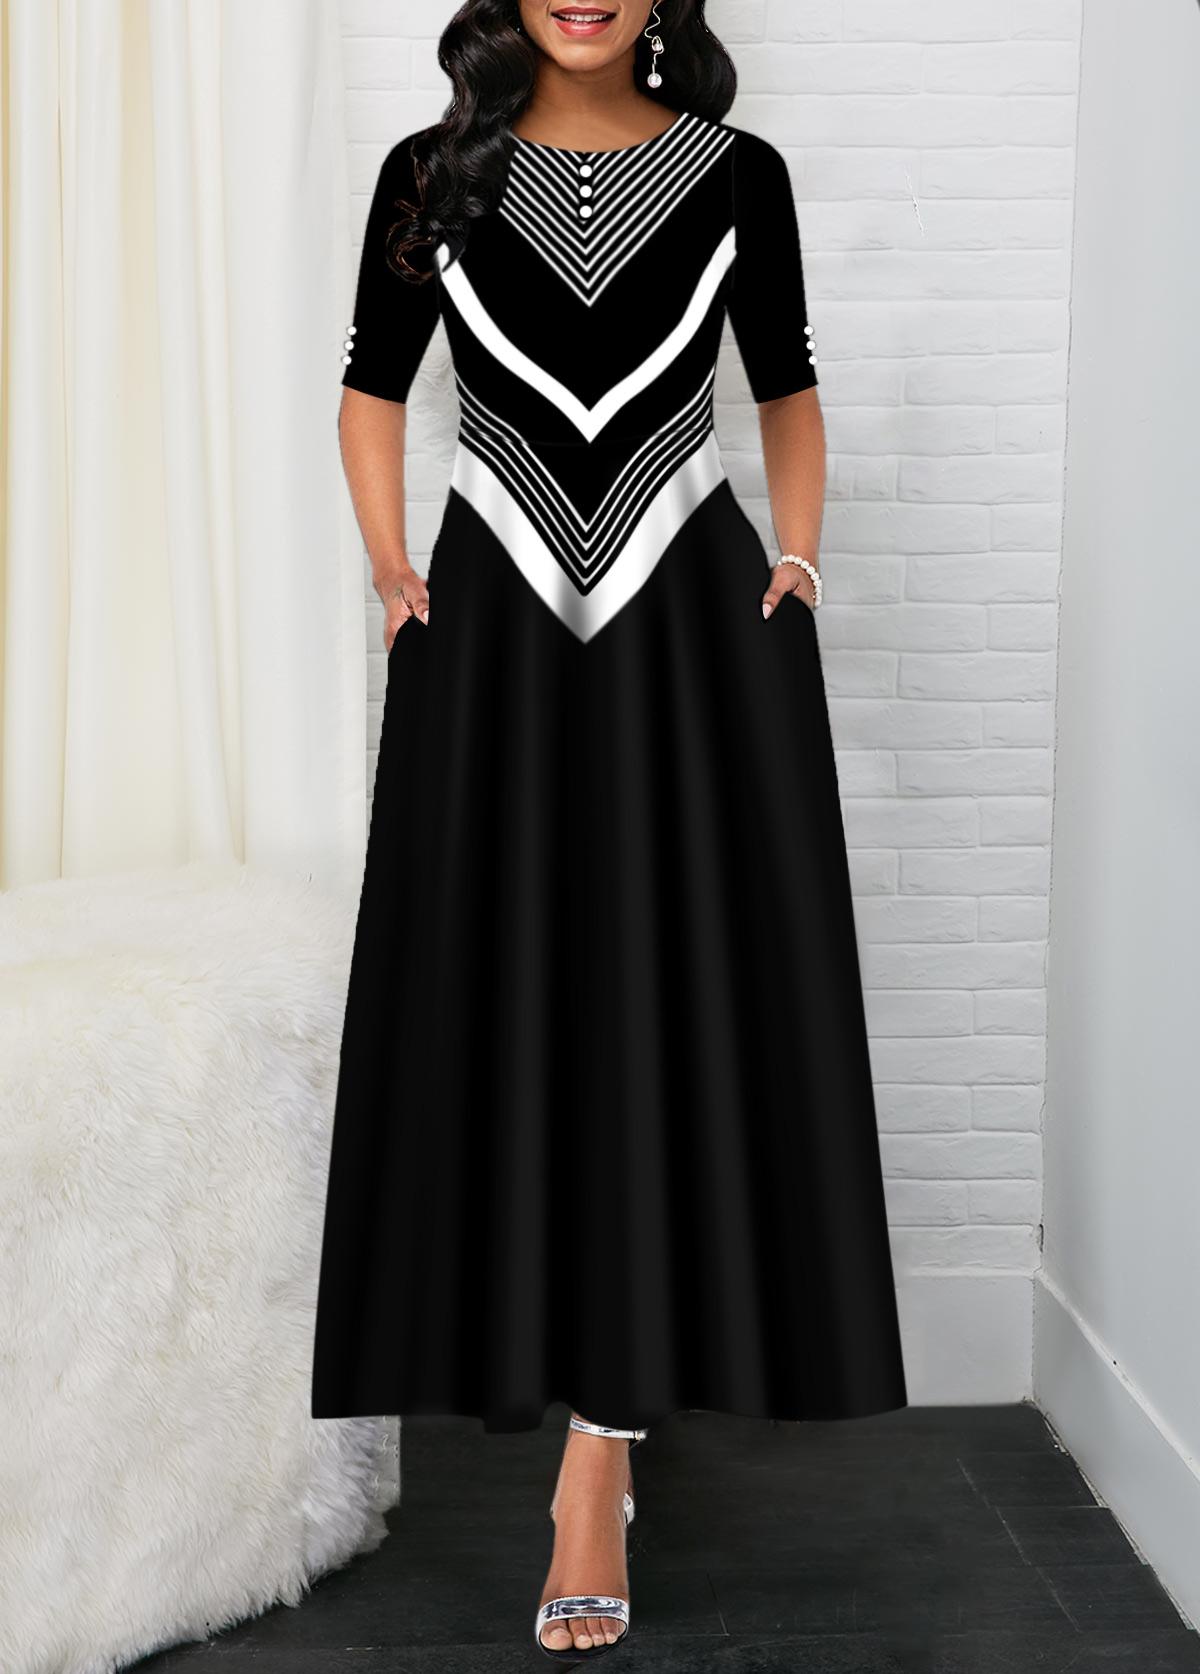 Black Chevron Print Back Zipper Maxi Dress